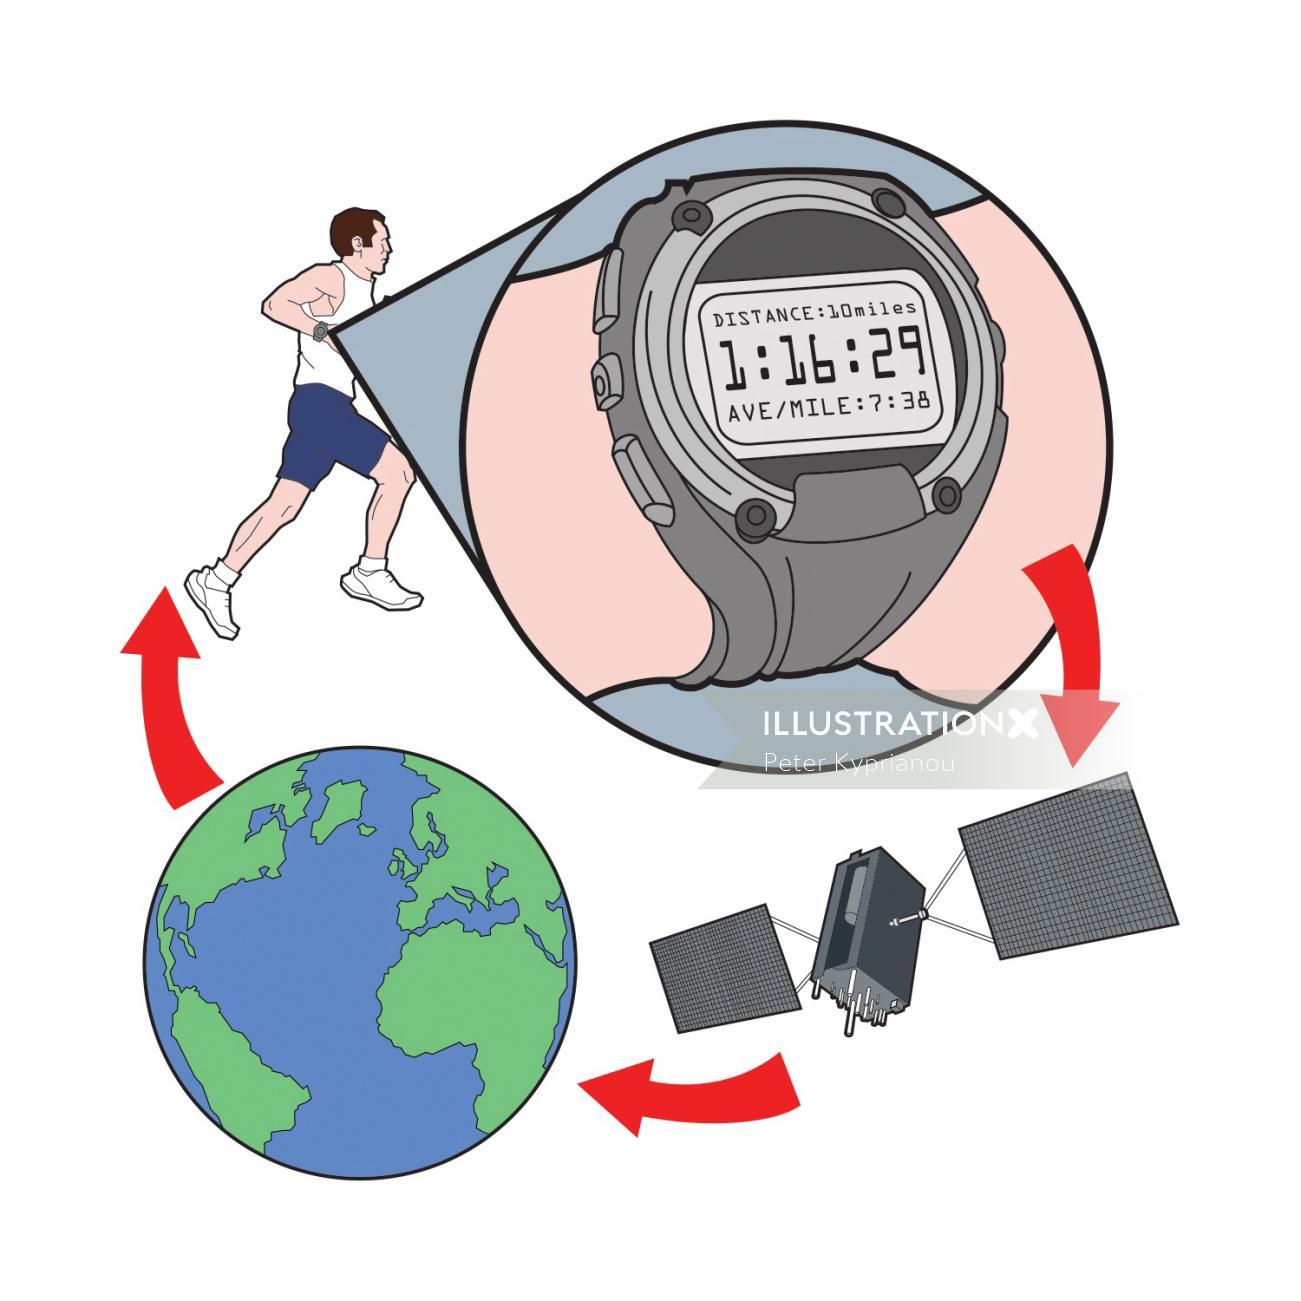 Man running illustration by Peter Kyprianou